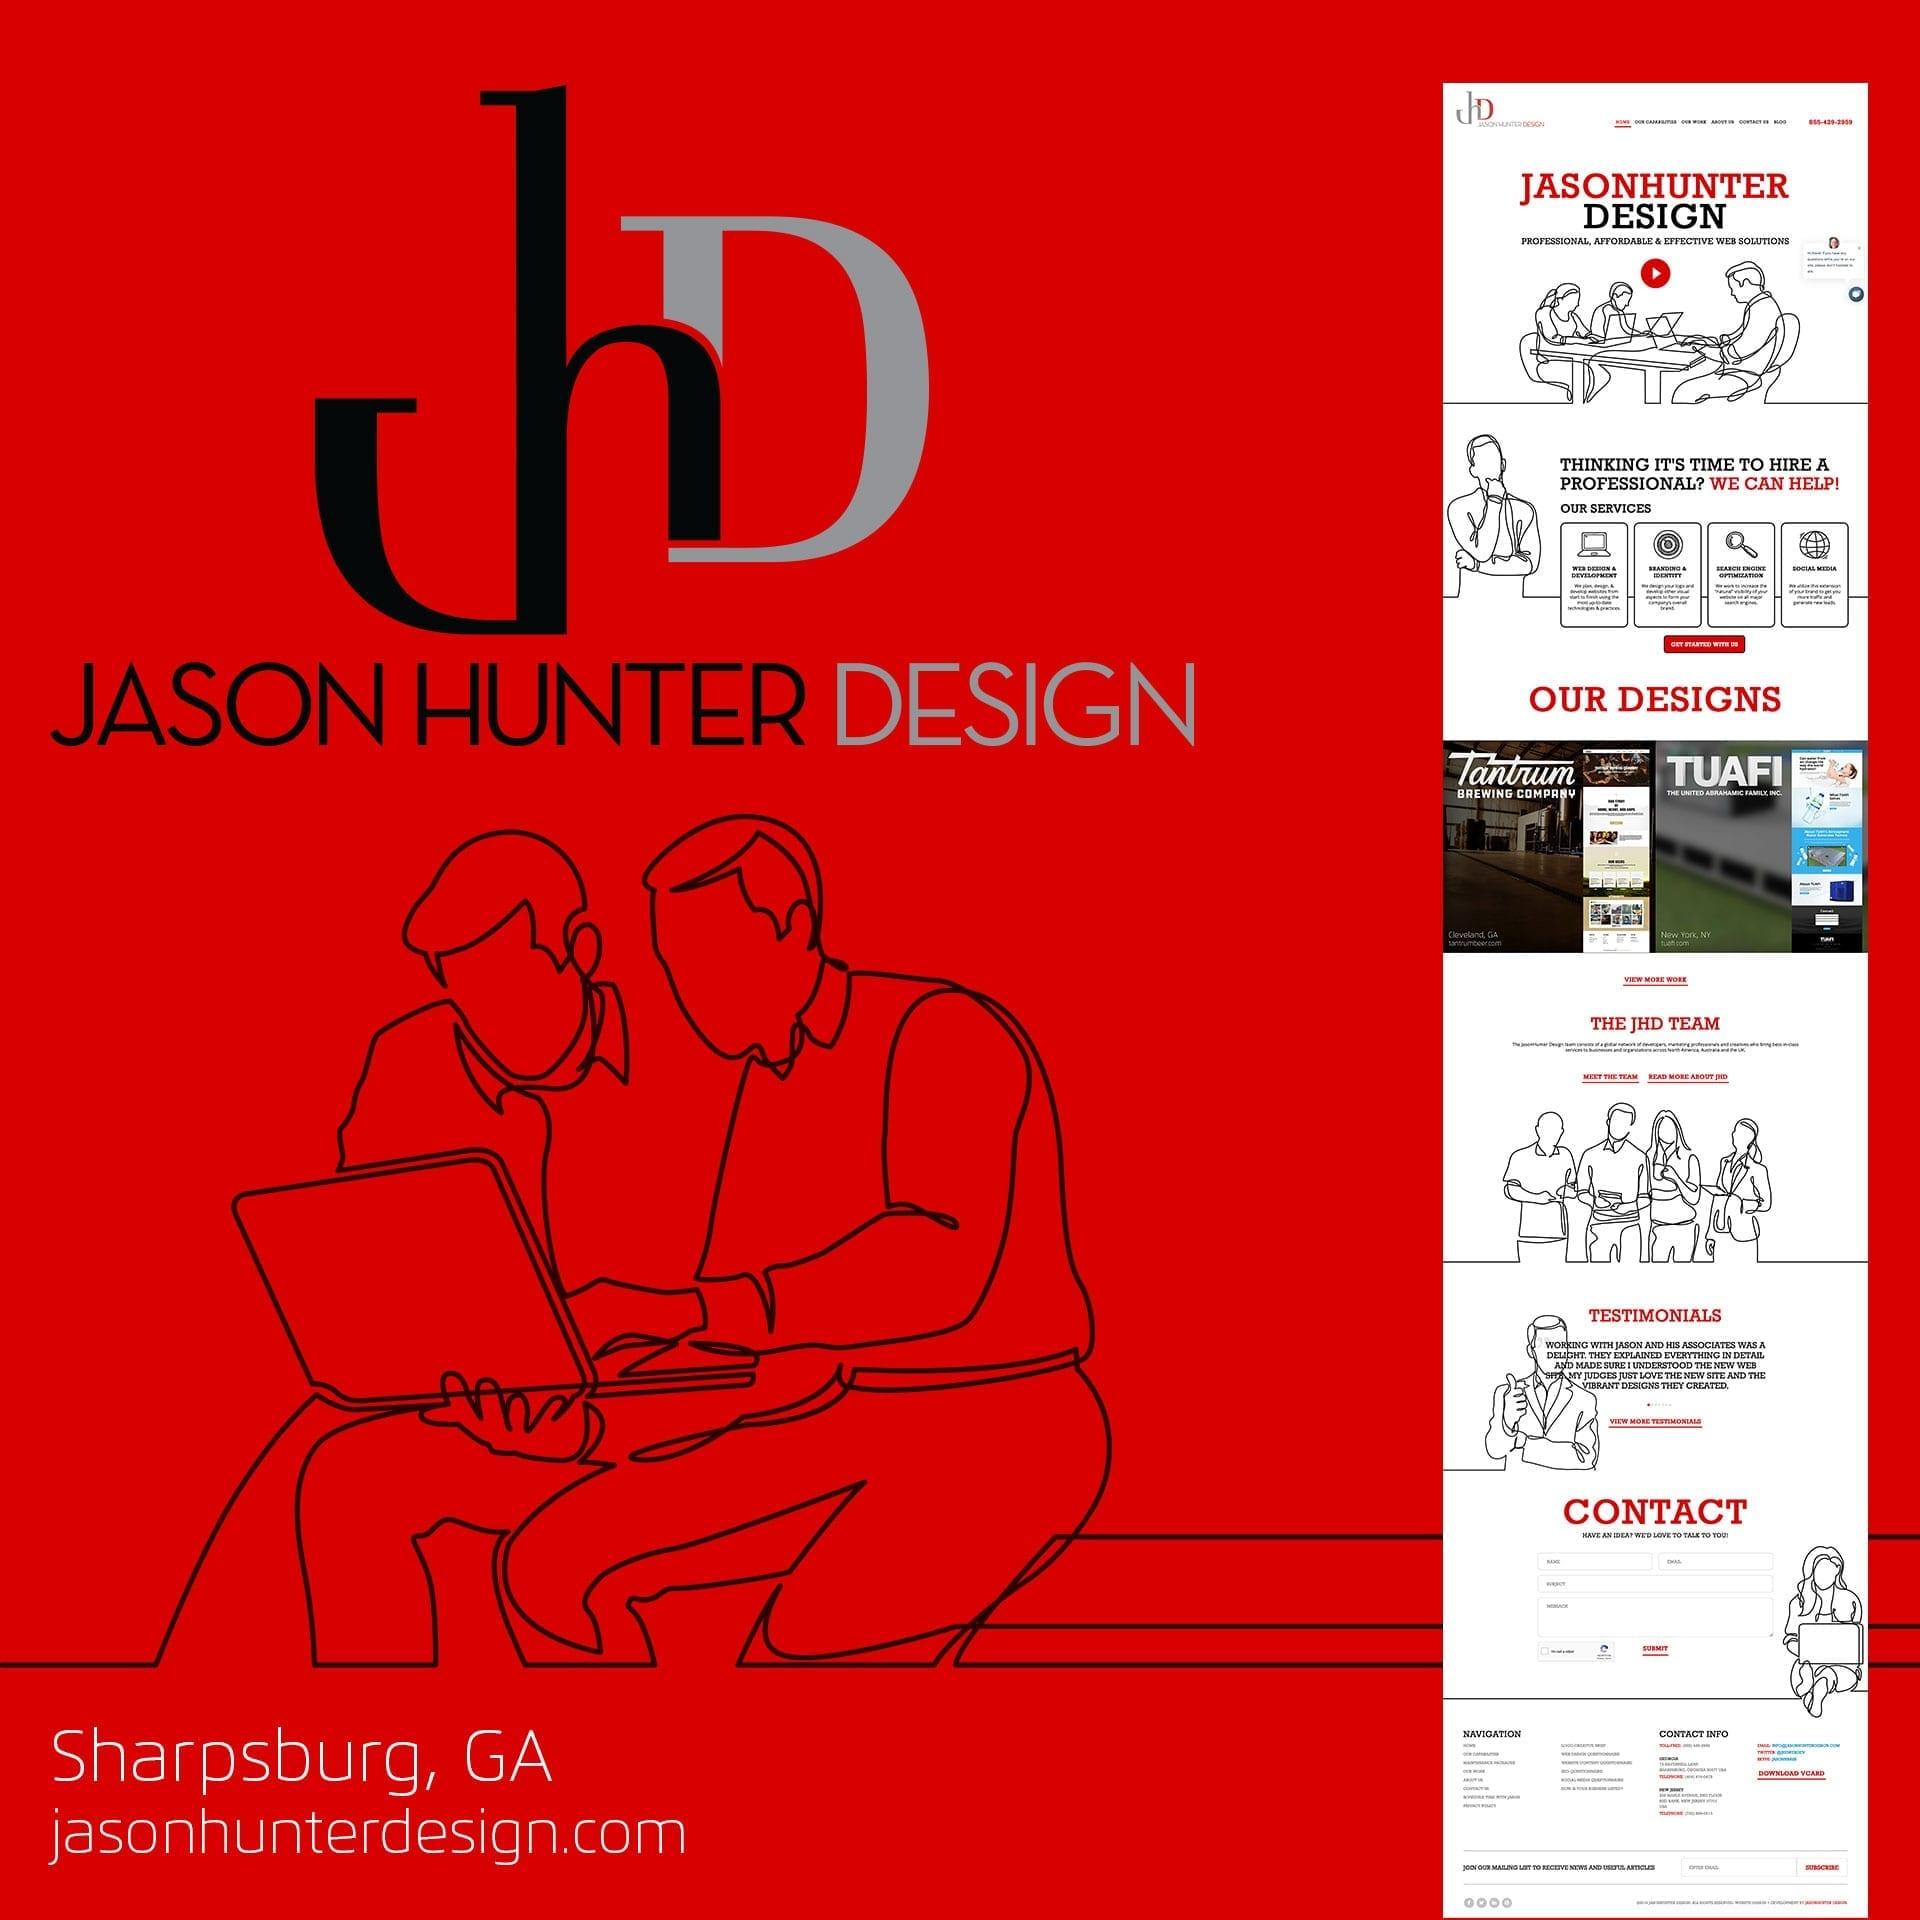 JasonHunter Design